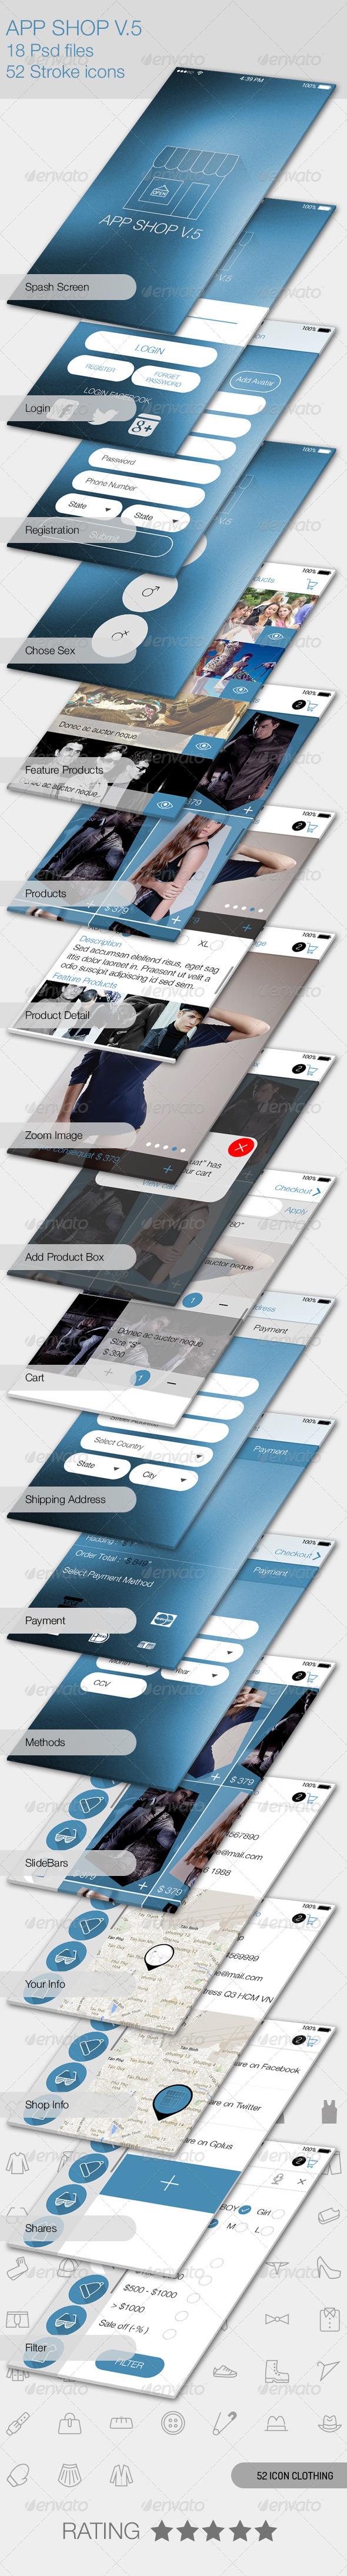 GraphicRiver App Shop V.5 for Mobile 5708208